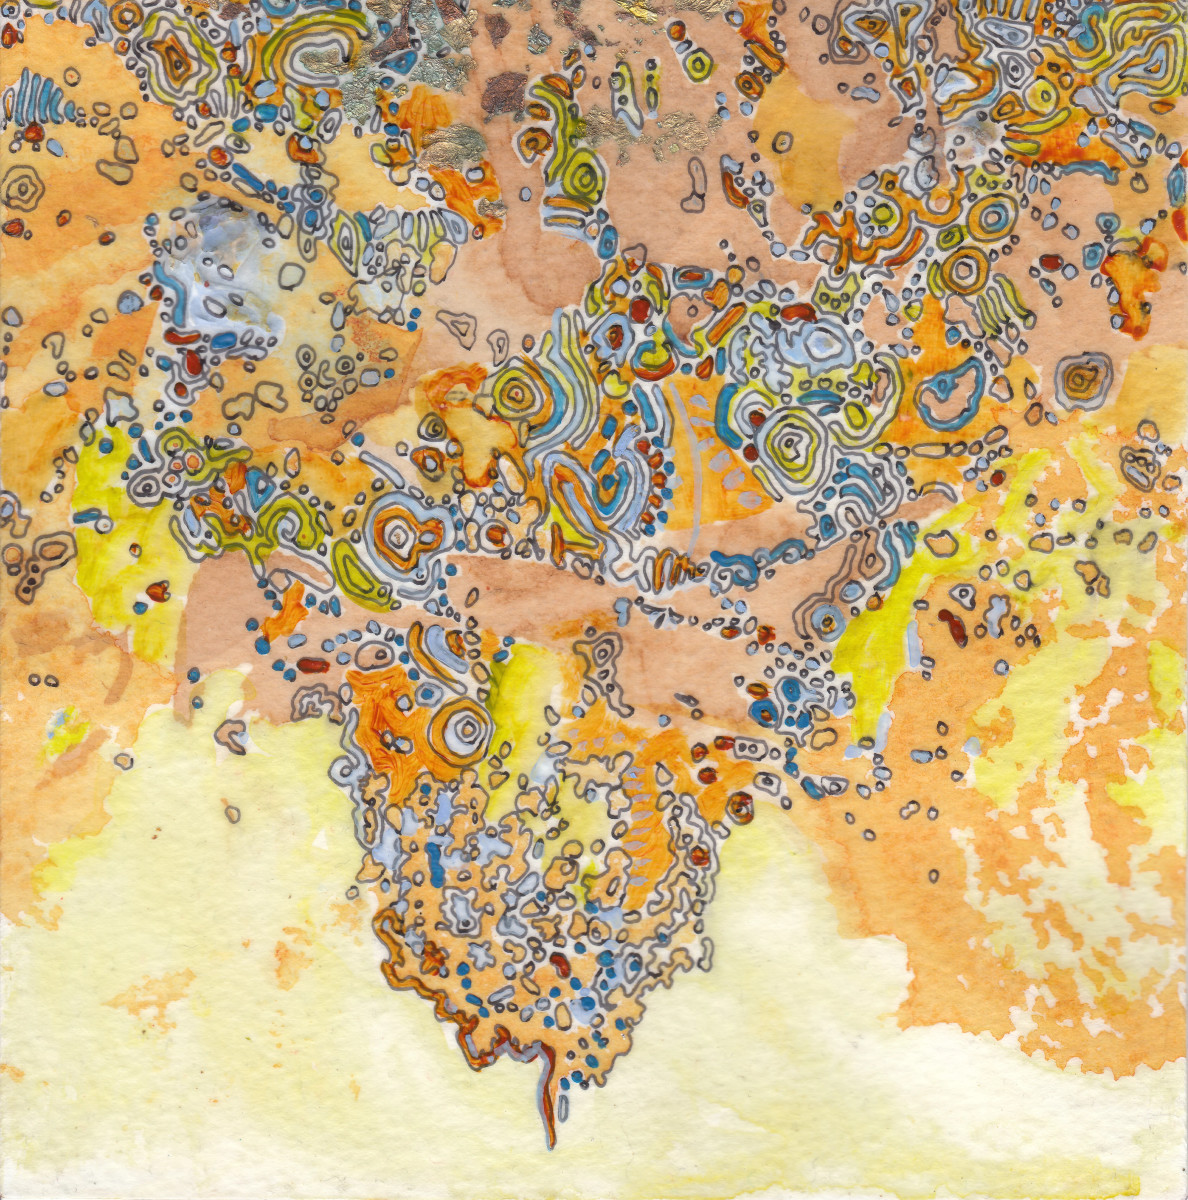 Sometimes I Dream by Gwen Meharg